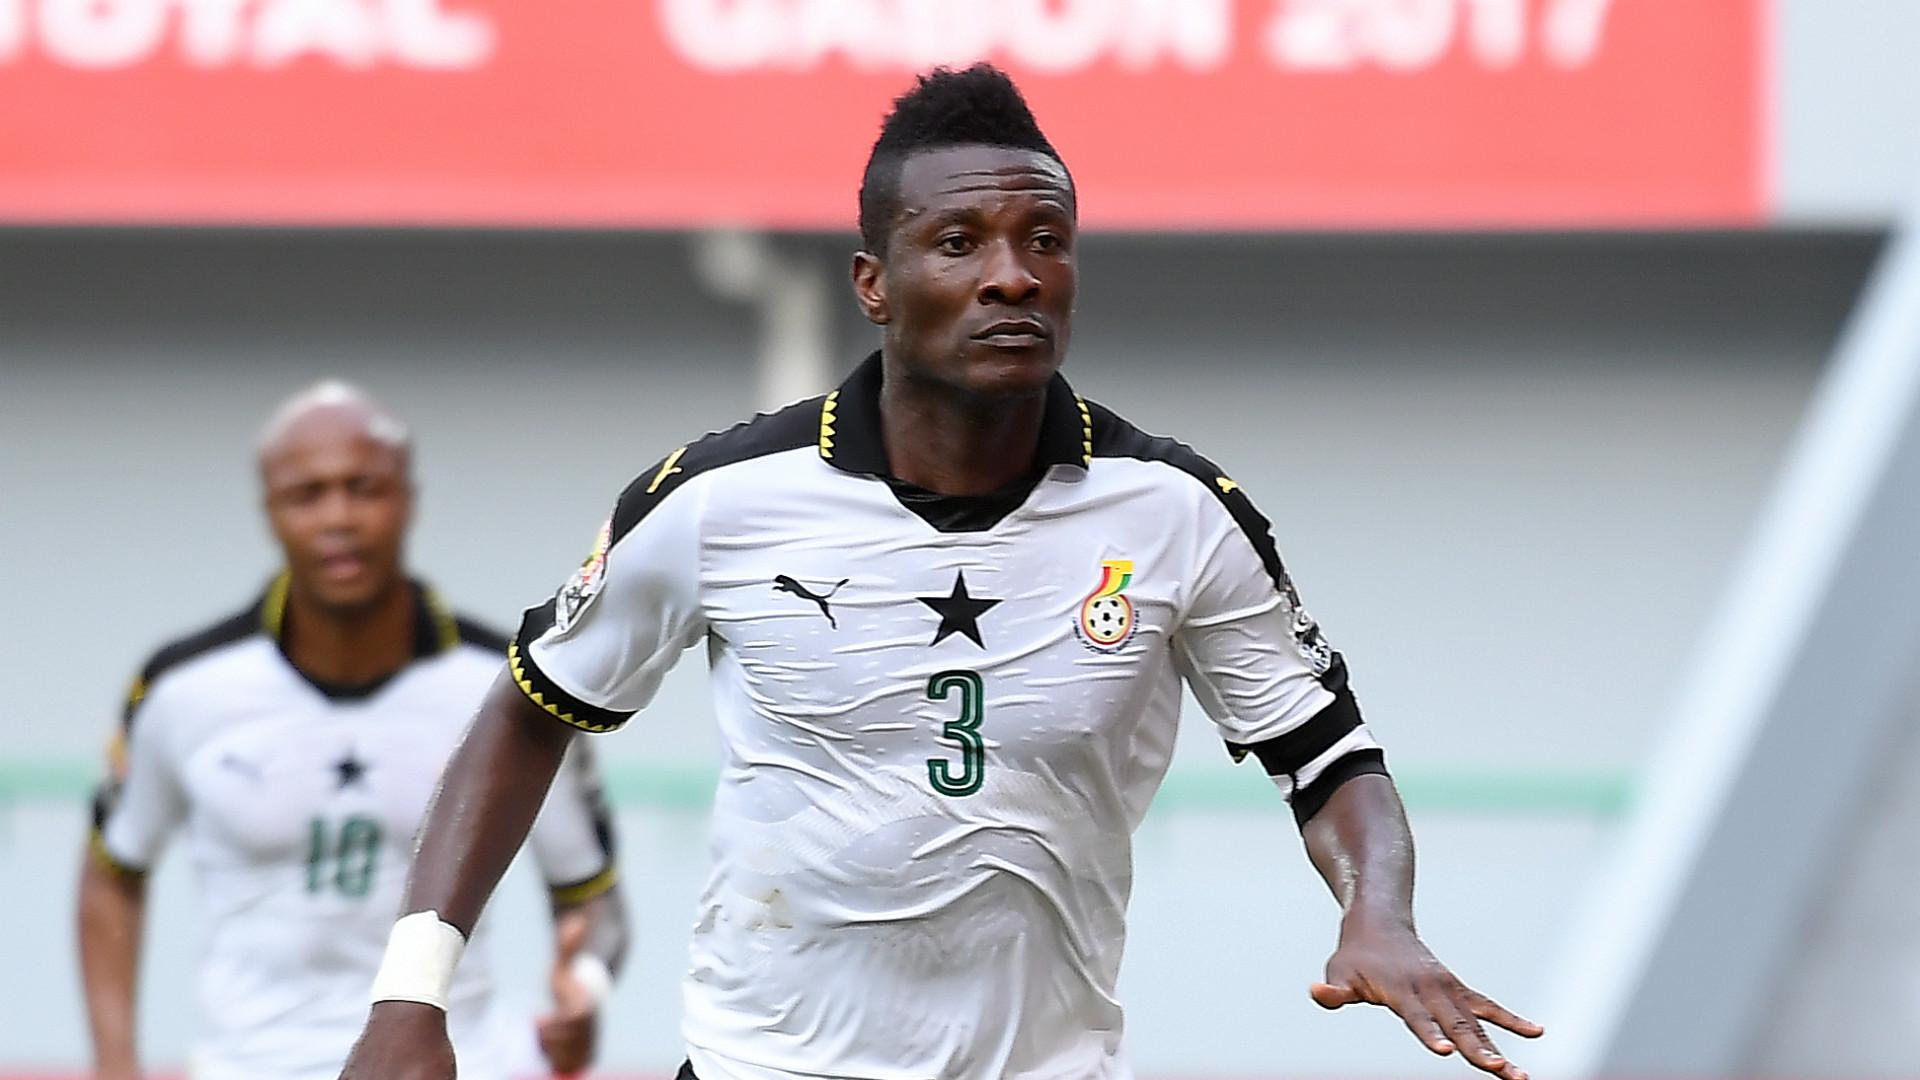 Asamoah Gyan signs for Ghanaian Premier League side Legon Cities   Goal.com